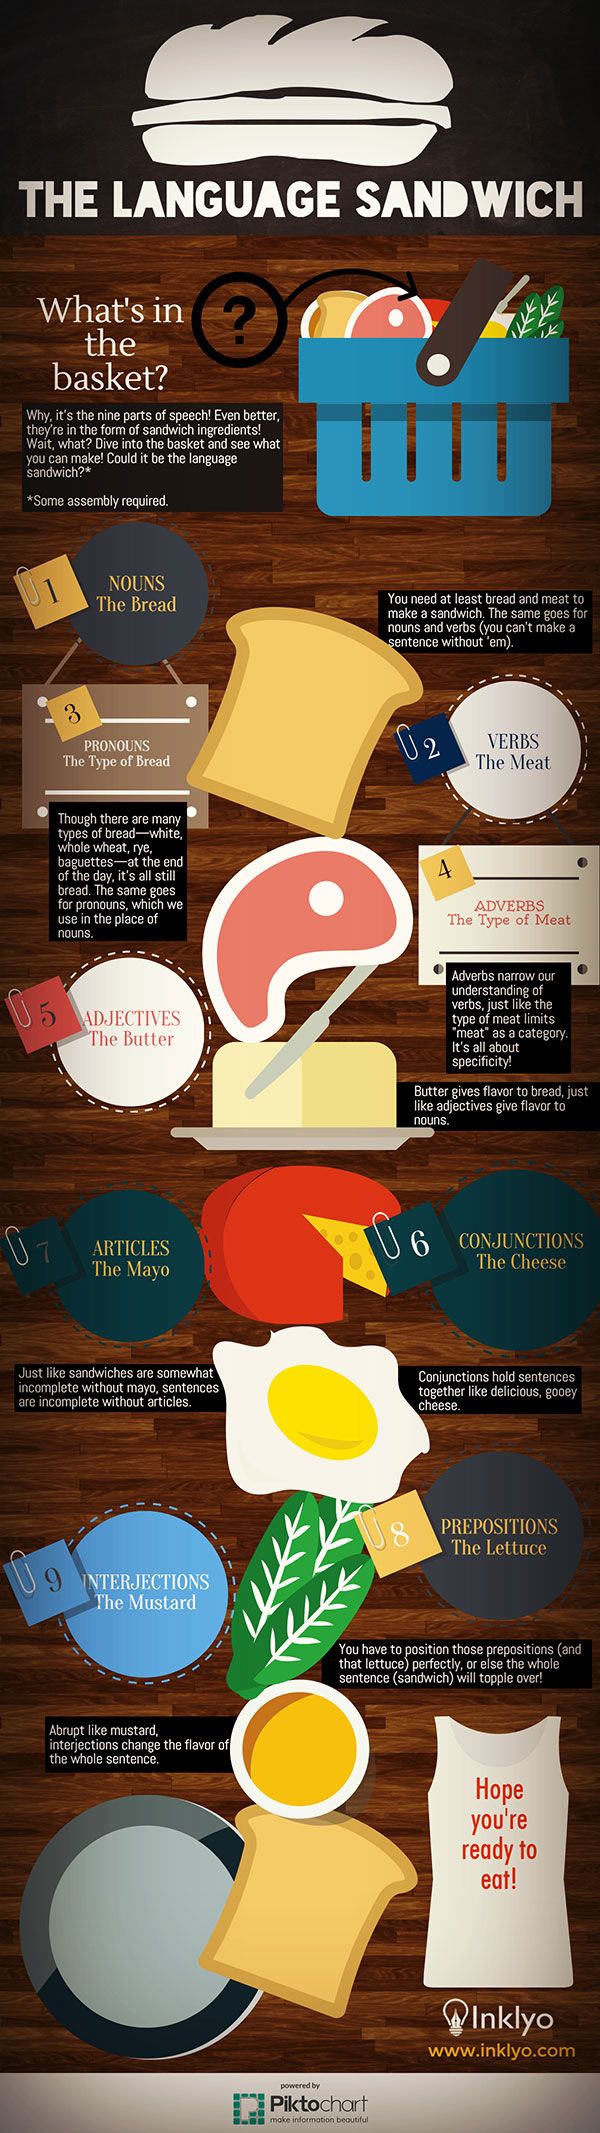 The Language Sandwich